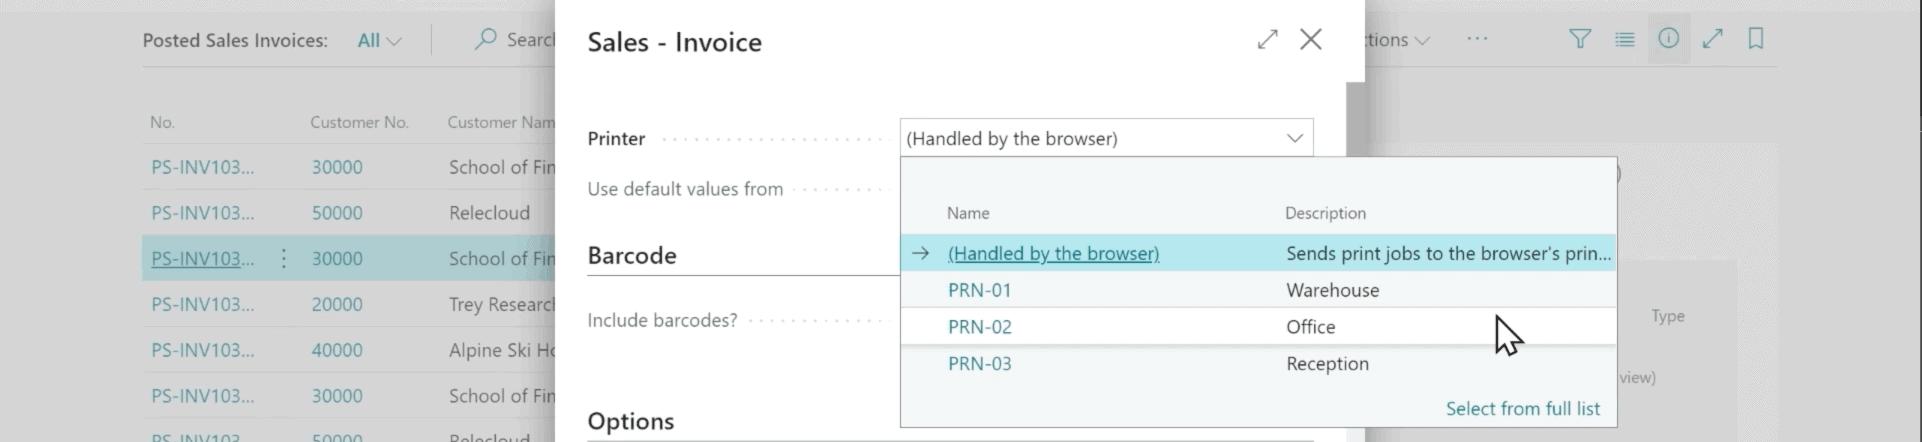 Microsoft Dynamics 365 Business Central Screenshot - Printer management